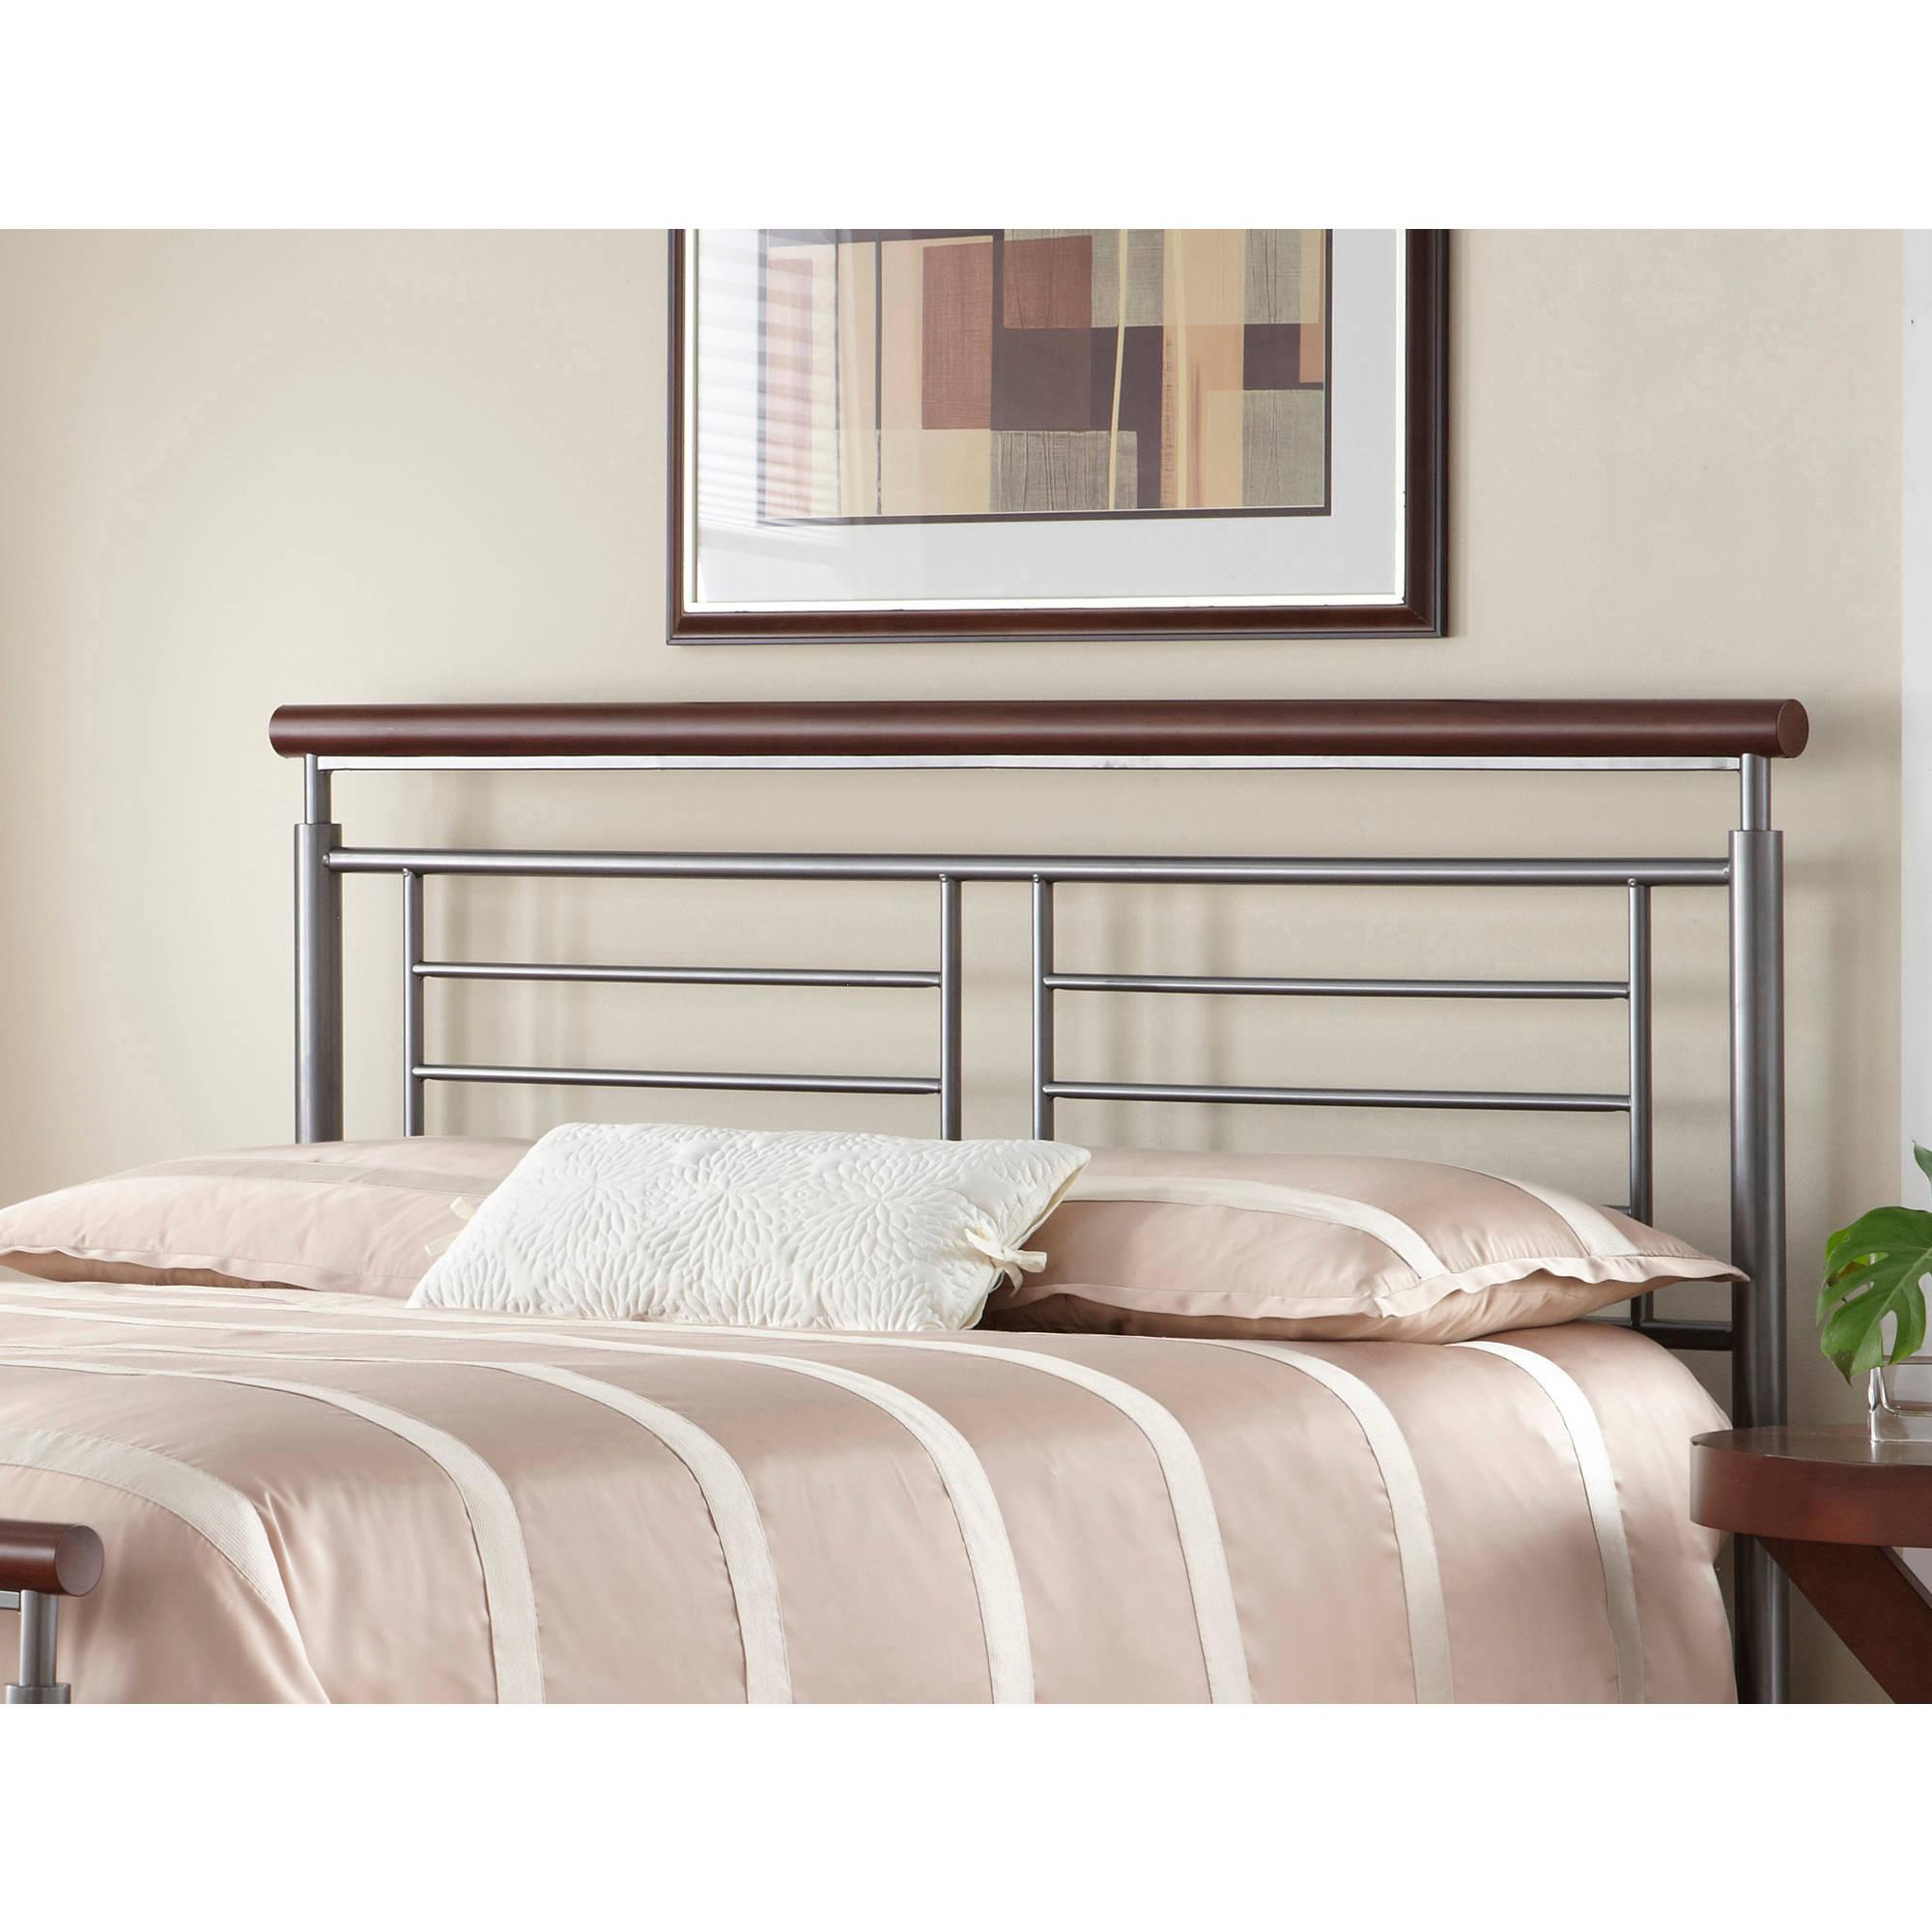 Fashion Bed Group by Leggett & Platt Fontane Silver/Cherry Headboard, Multiple Sizes